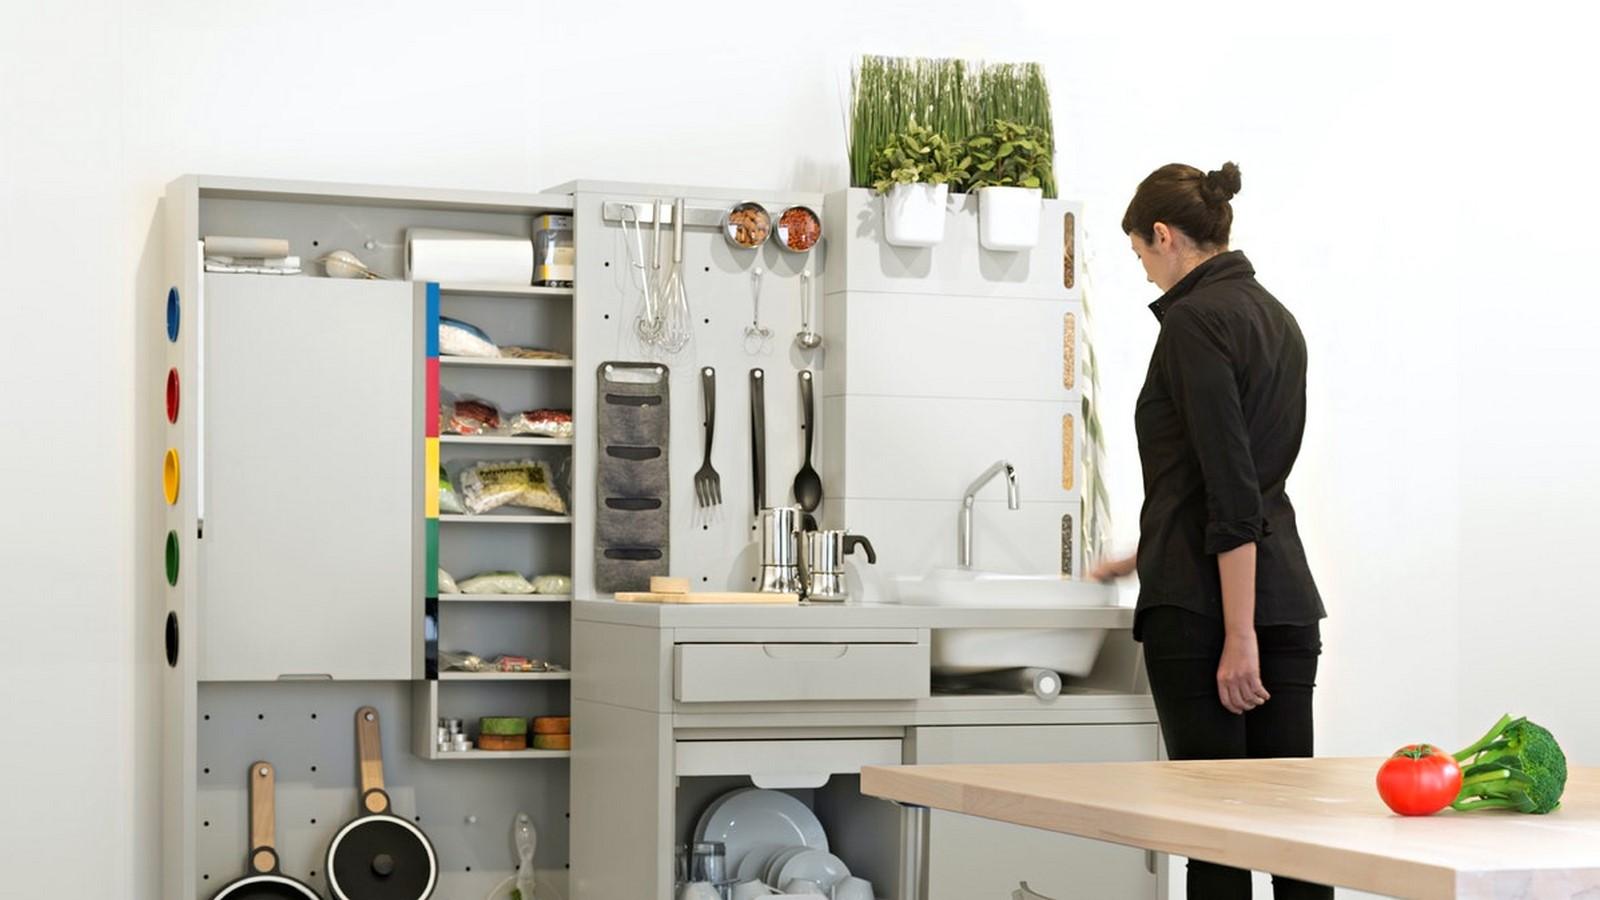 THE FUTURE KITCHEN FOR IKEA -Sheet2